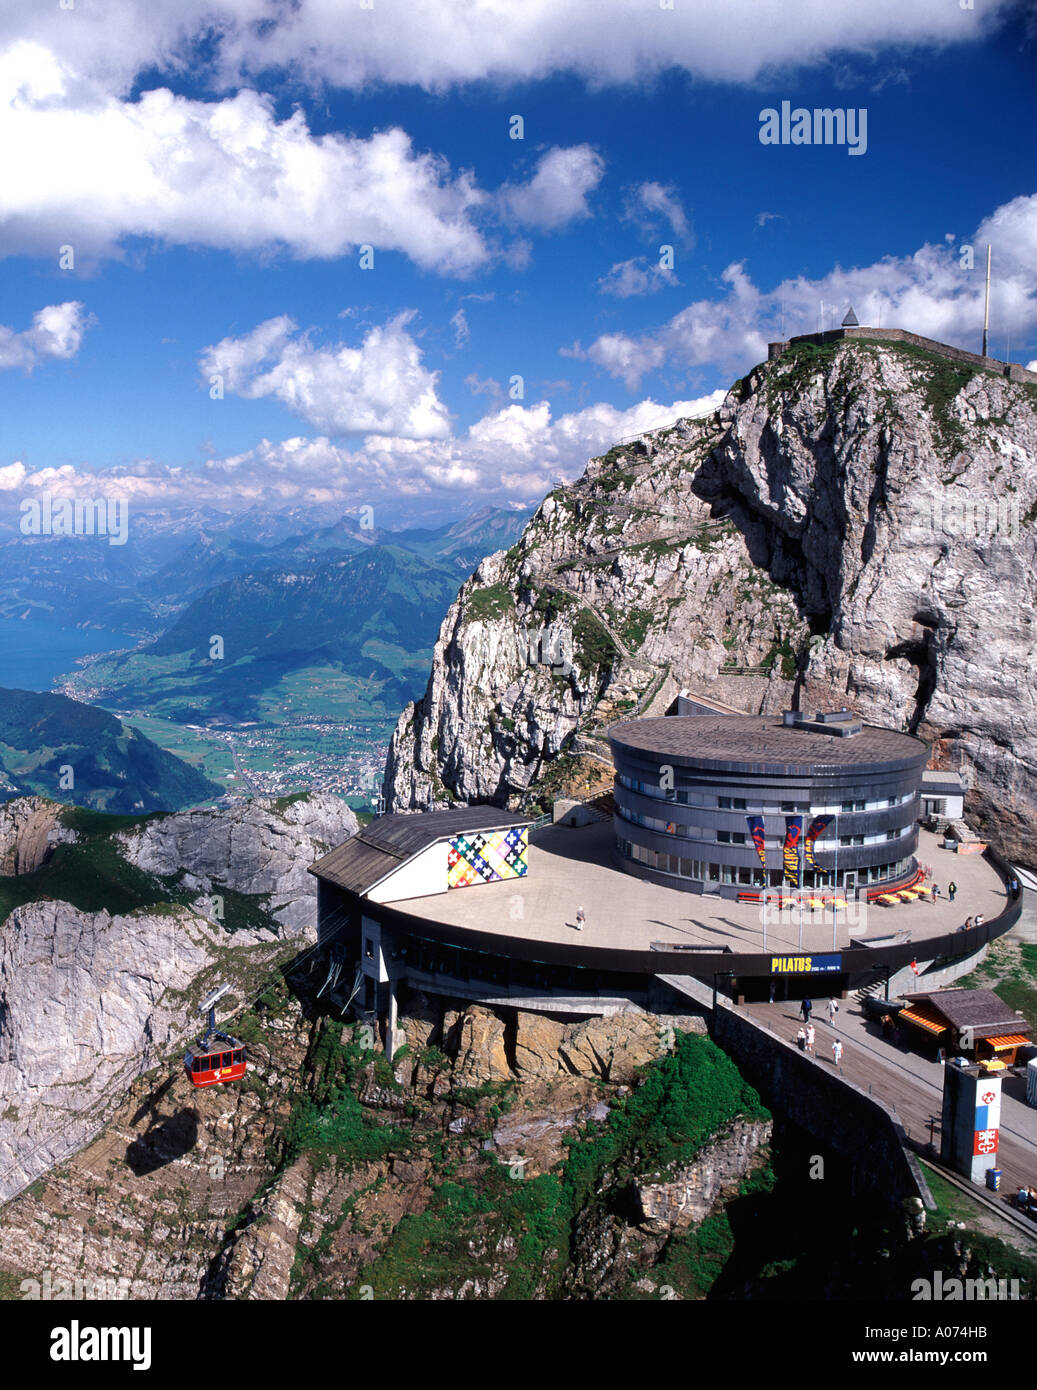 Mount Pilatus, Lucerne, Switzerland - Stock Image